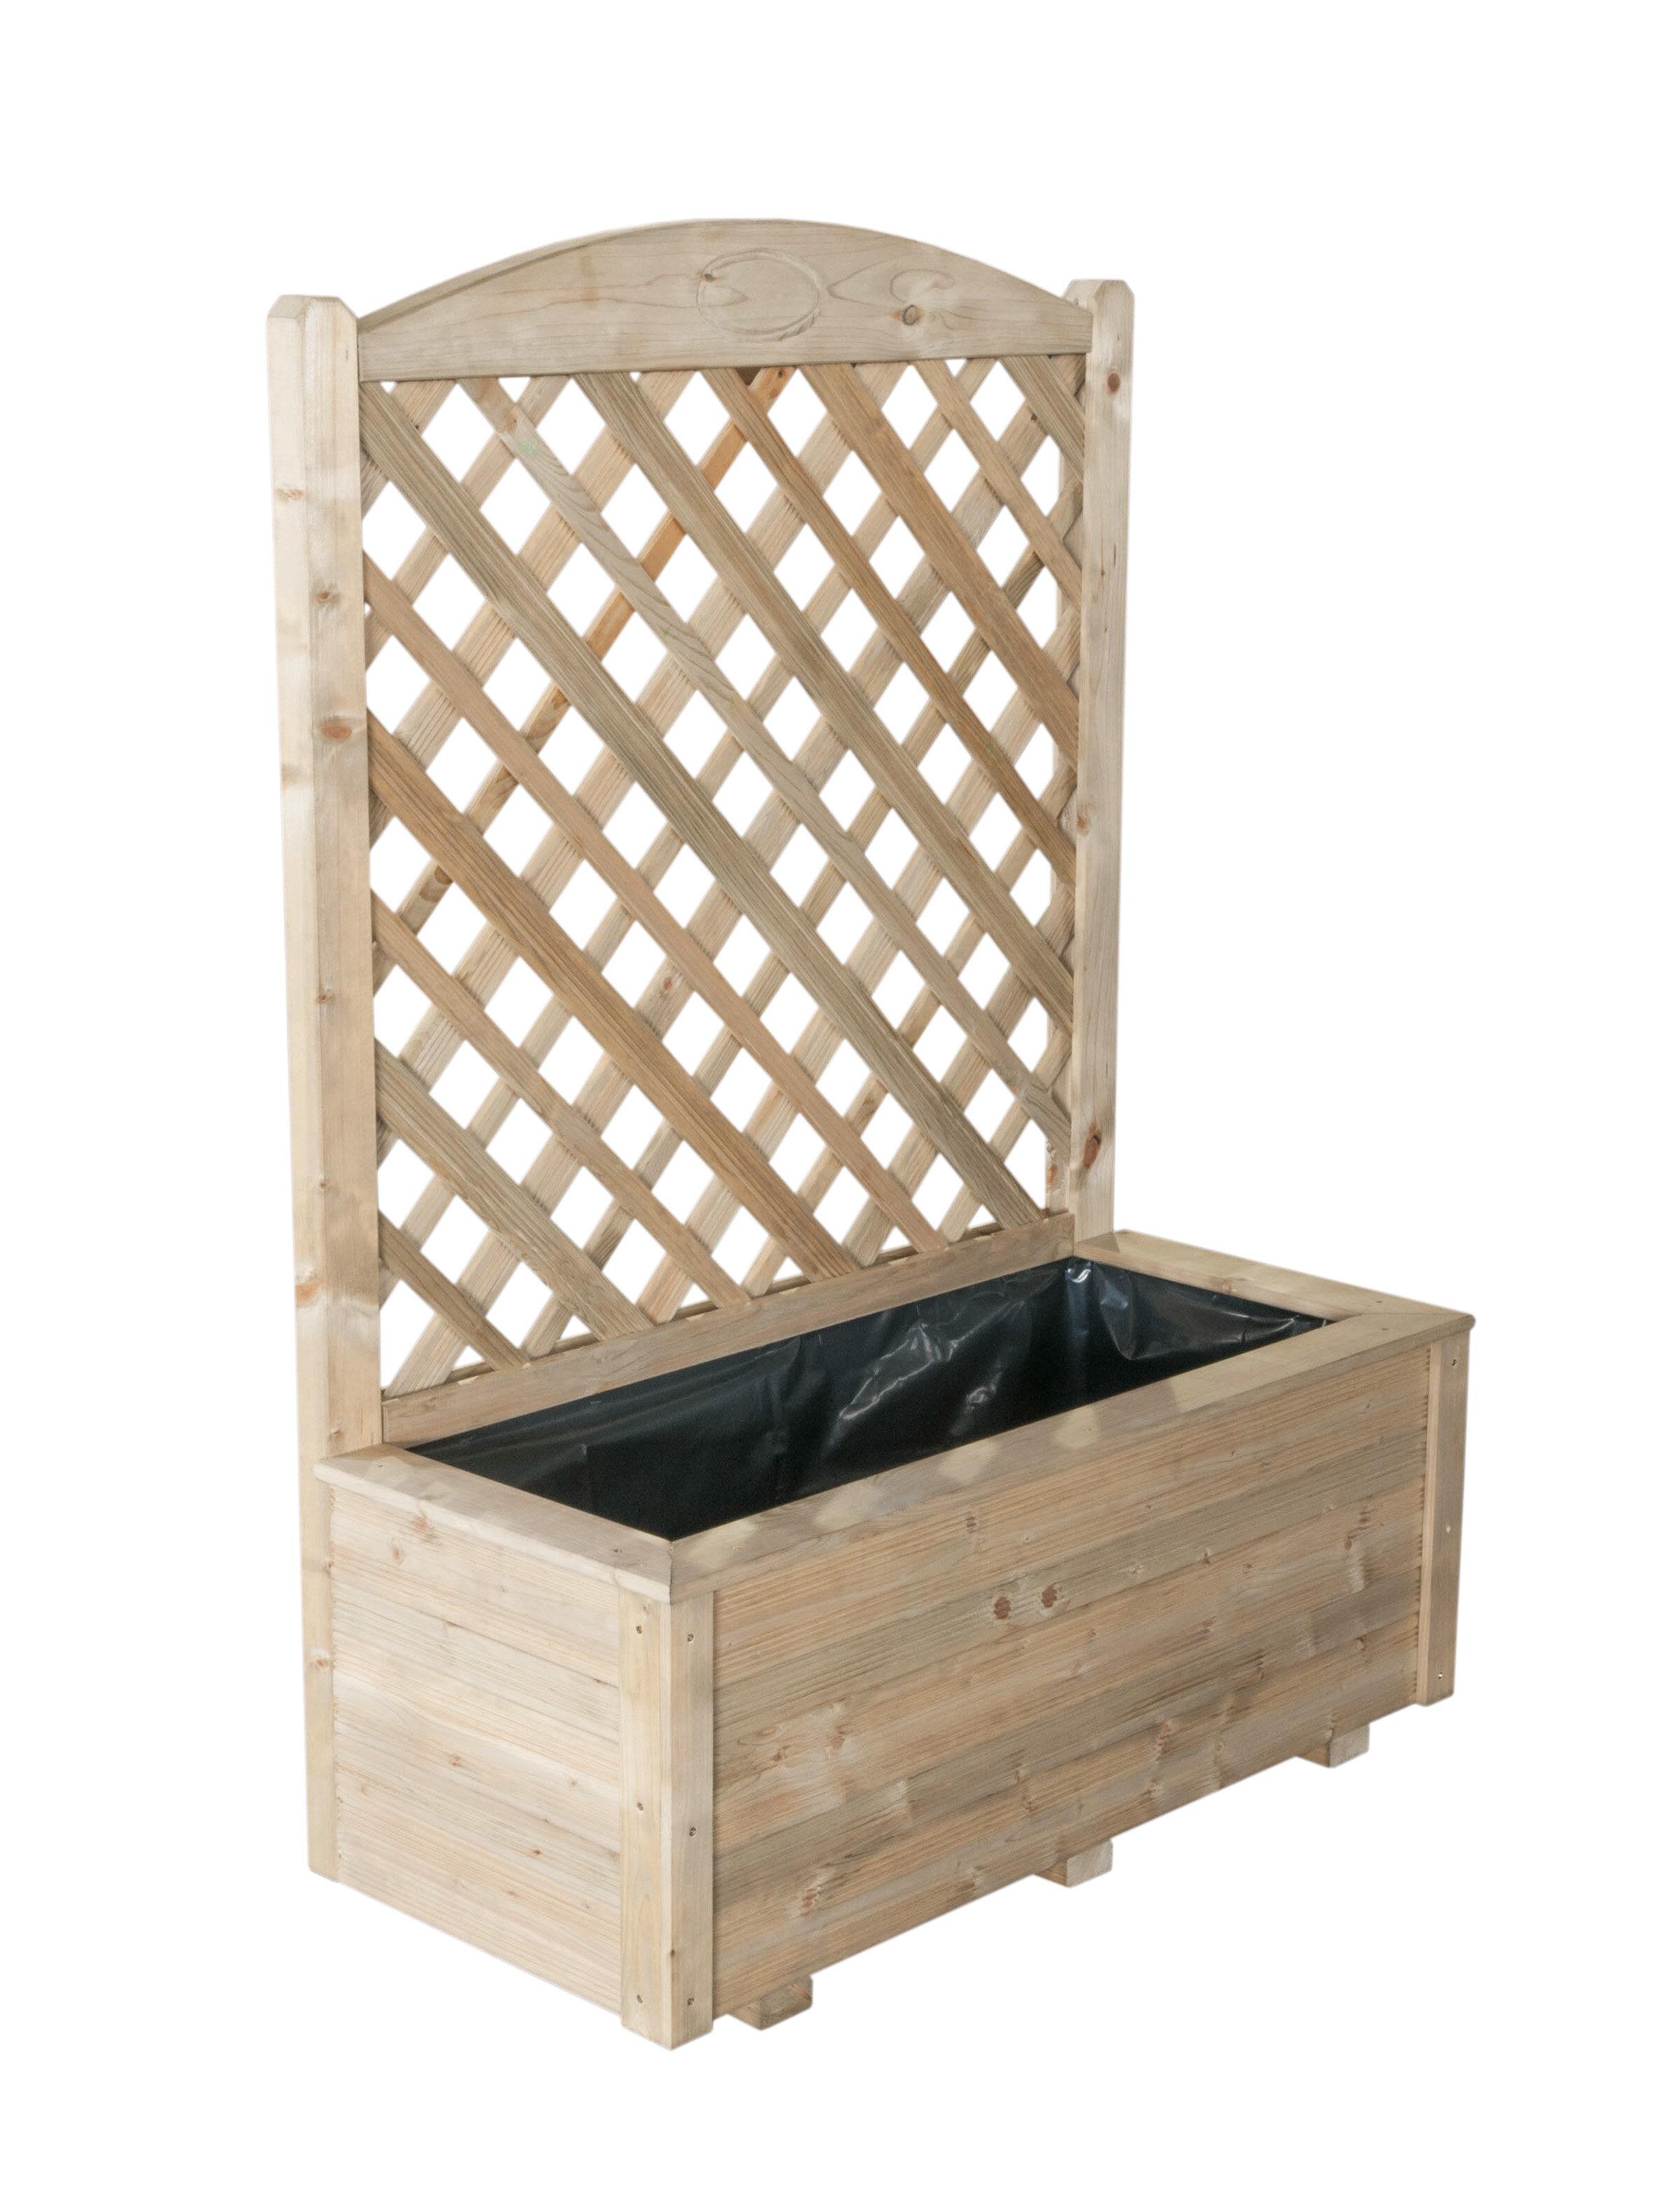 Diamond Planter Box With Trellis